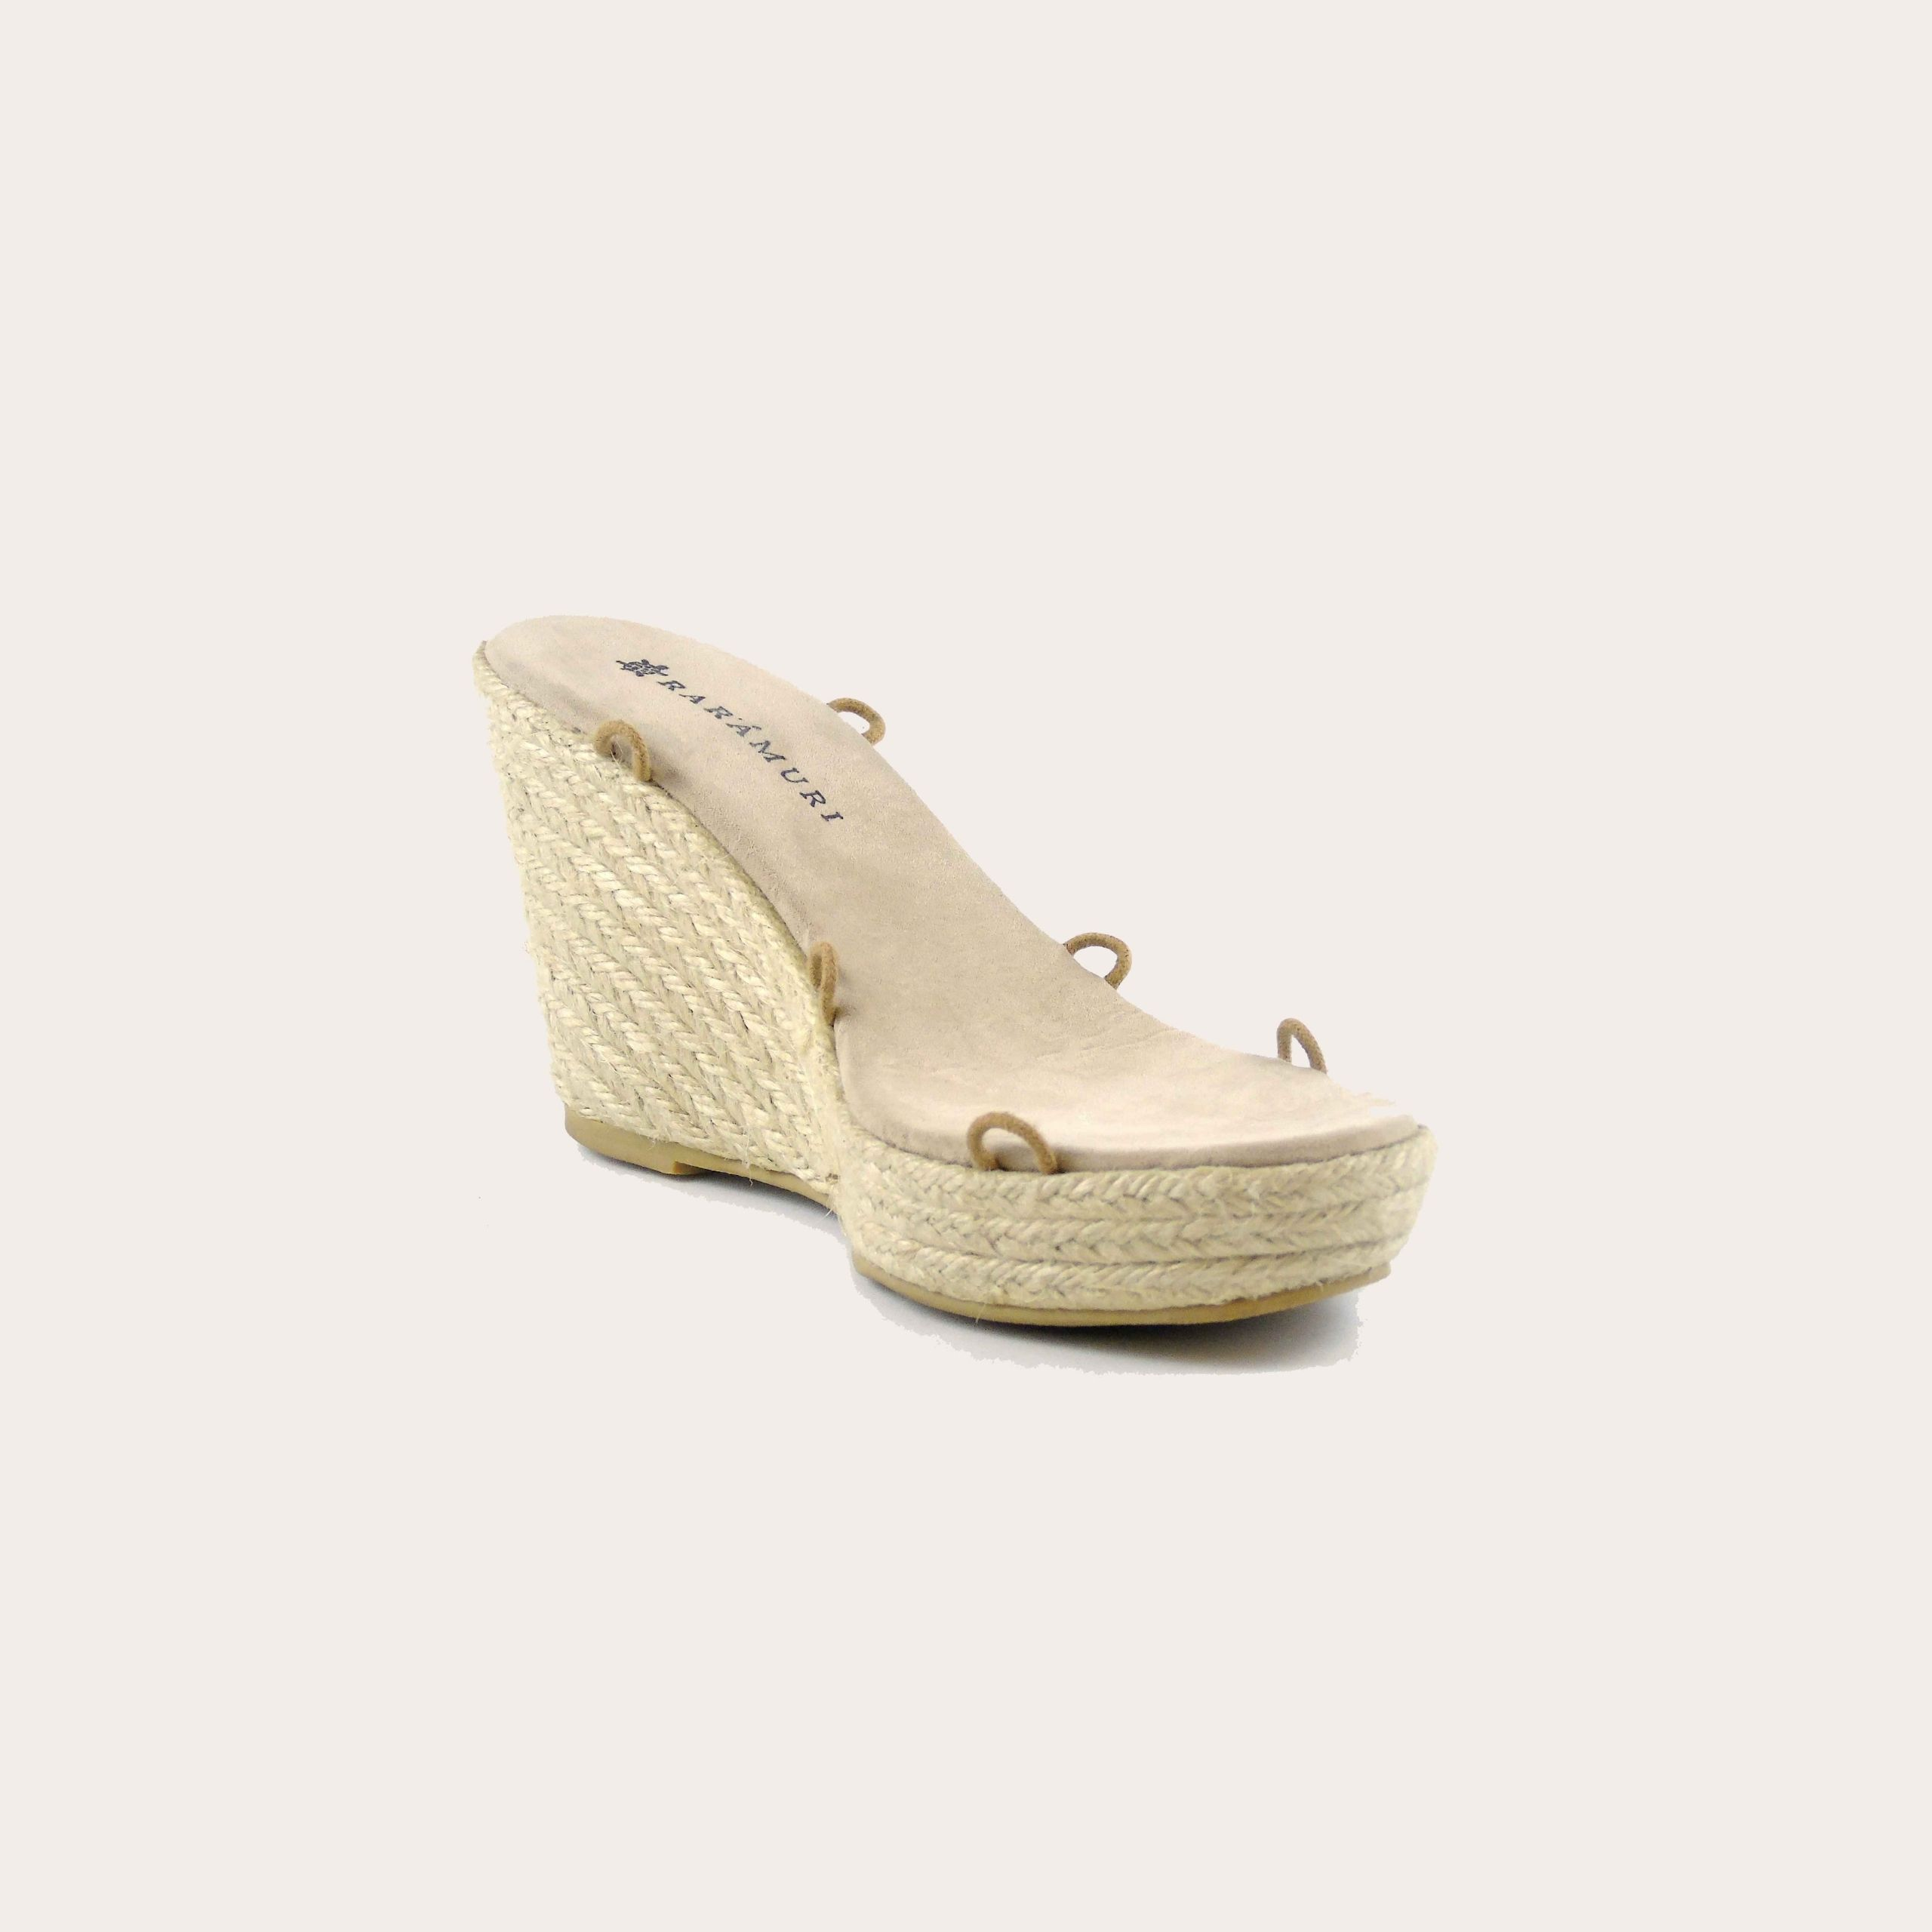 chilon_2_lintsandalen sandals travelsandals vegan sustainable sandals wikkelsandalen